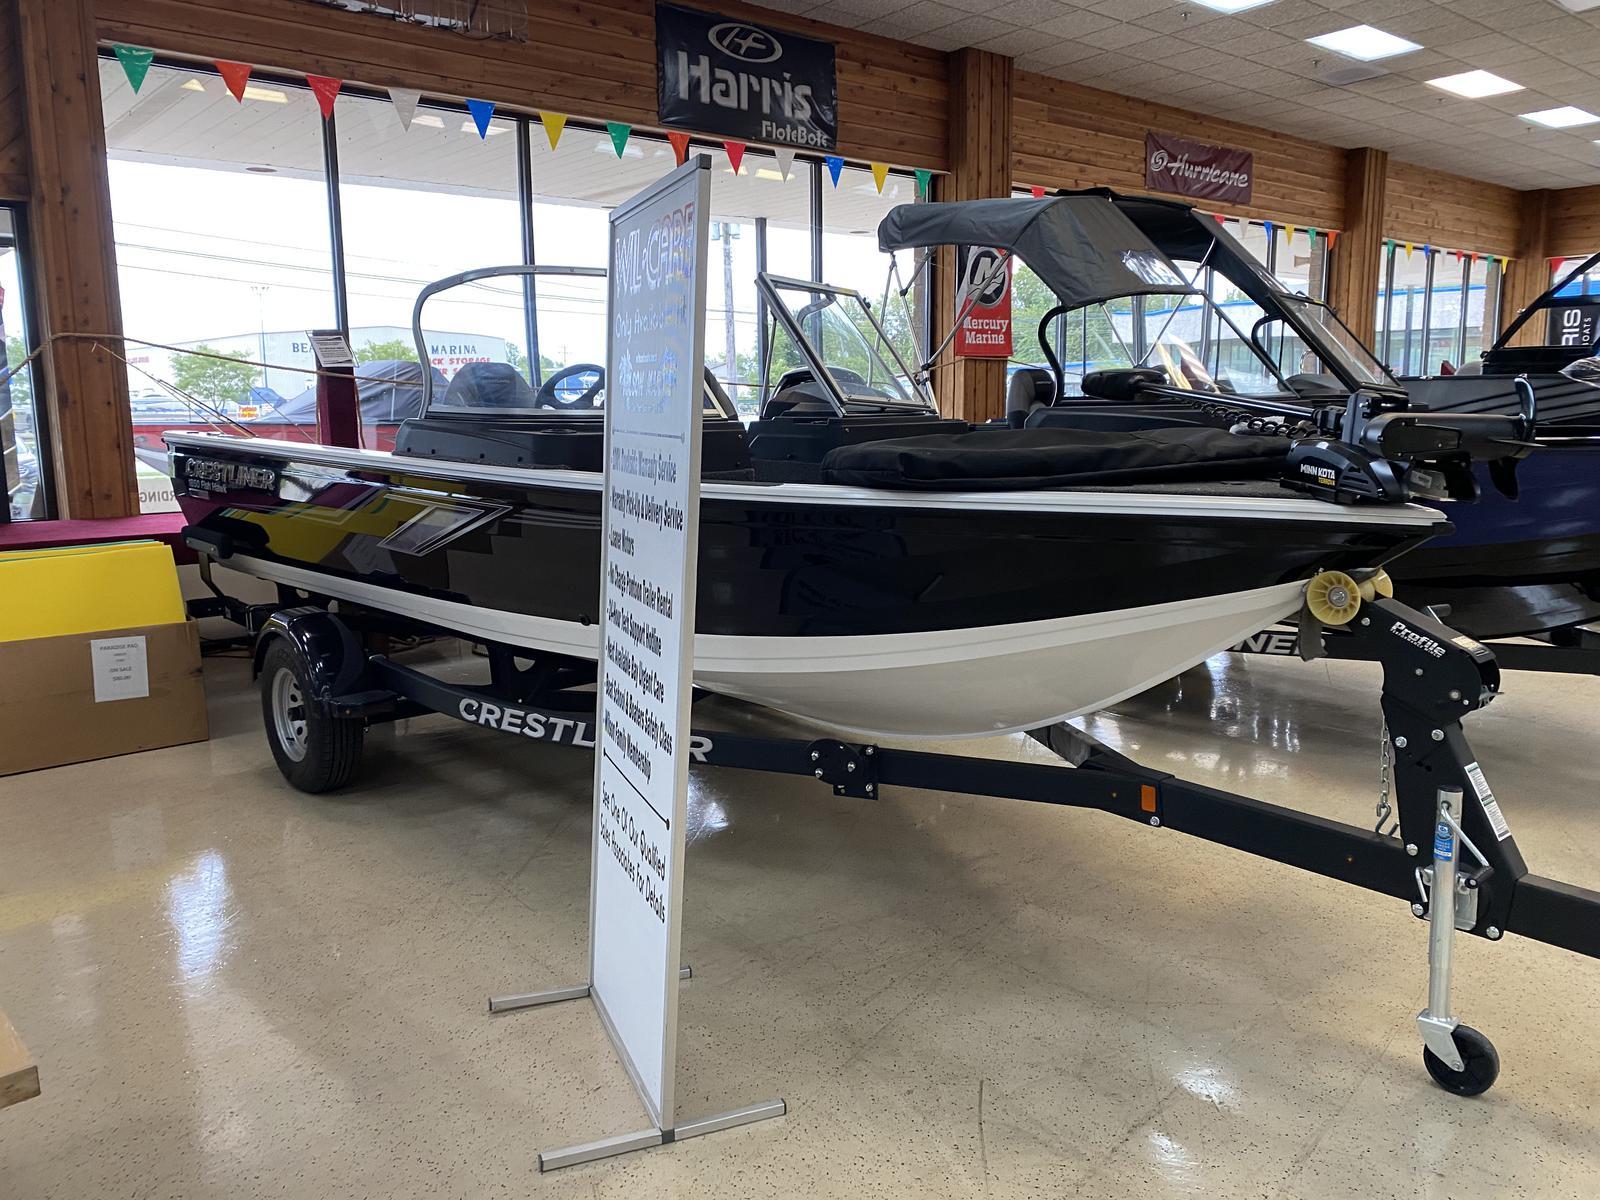 2020 Crestliner boat for sale, model of the boat is 1850 Fish Hawk Walk-through JS & Image # 1 of 28